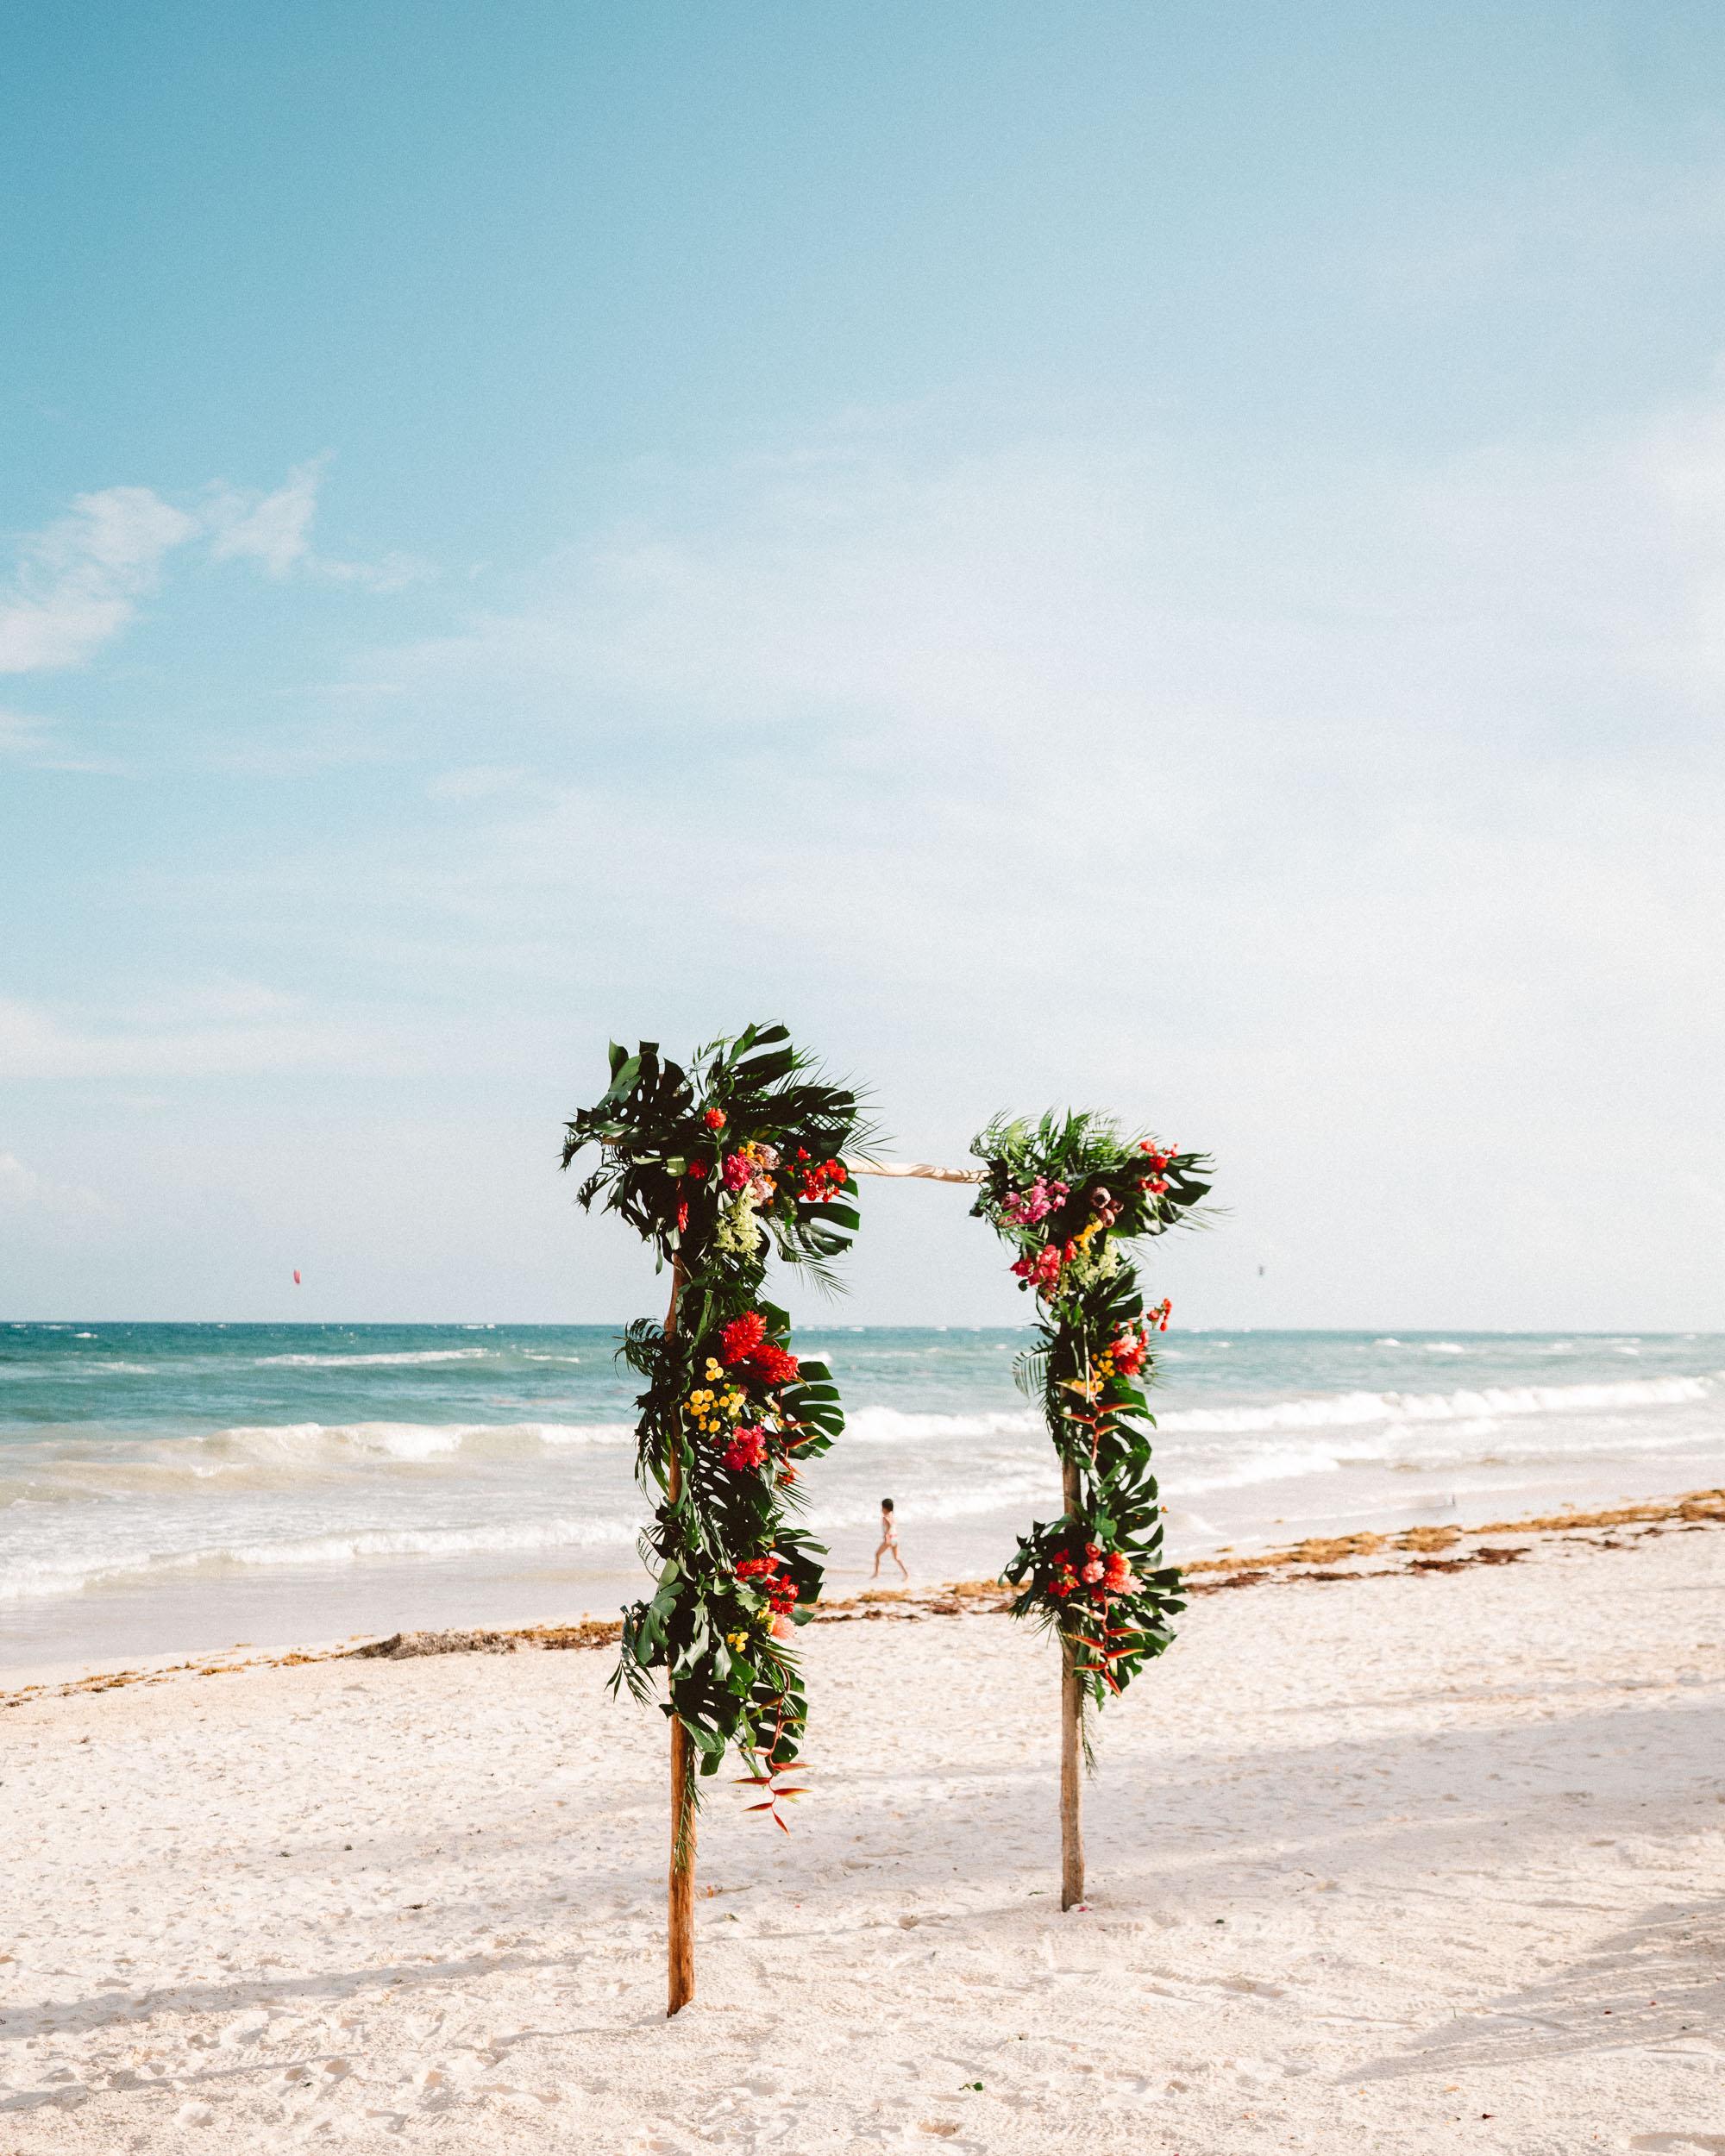 Beach wedding in Tulum Quintana Roo Mexico via Find Us Lost